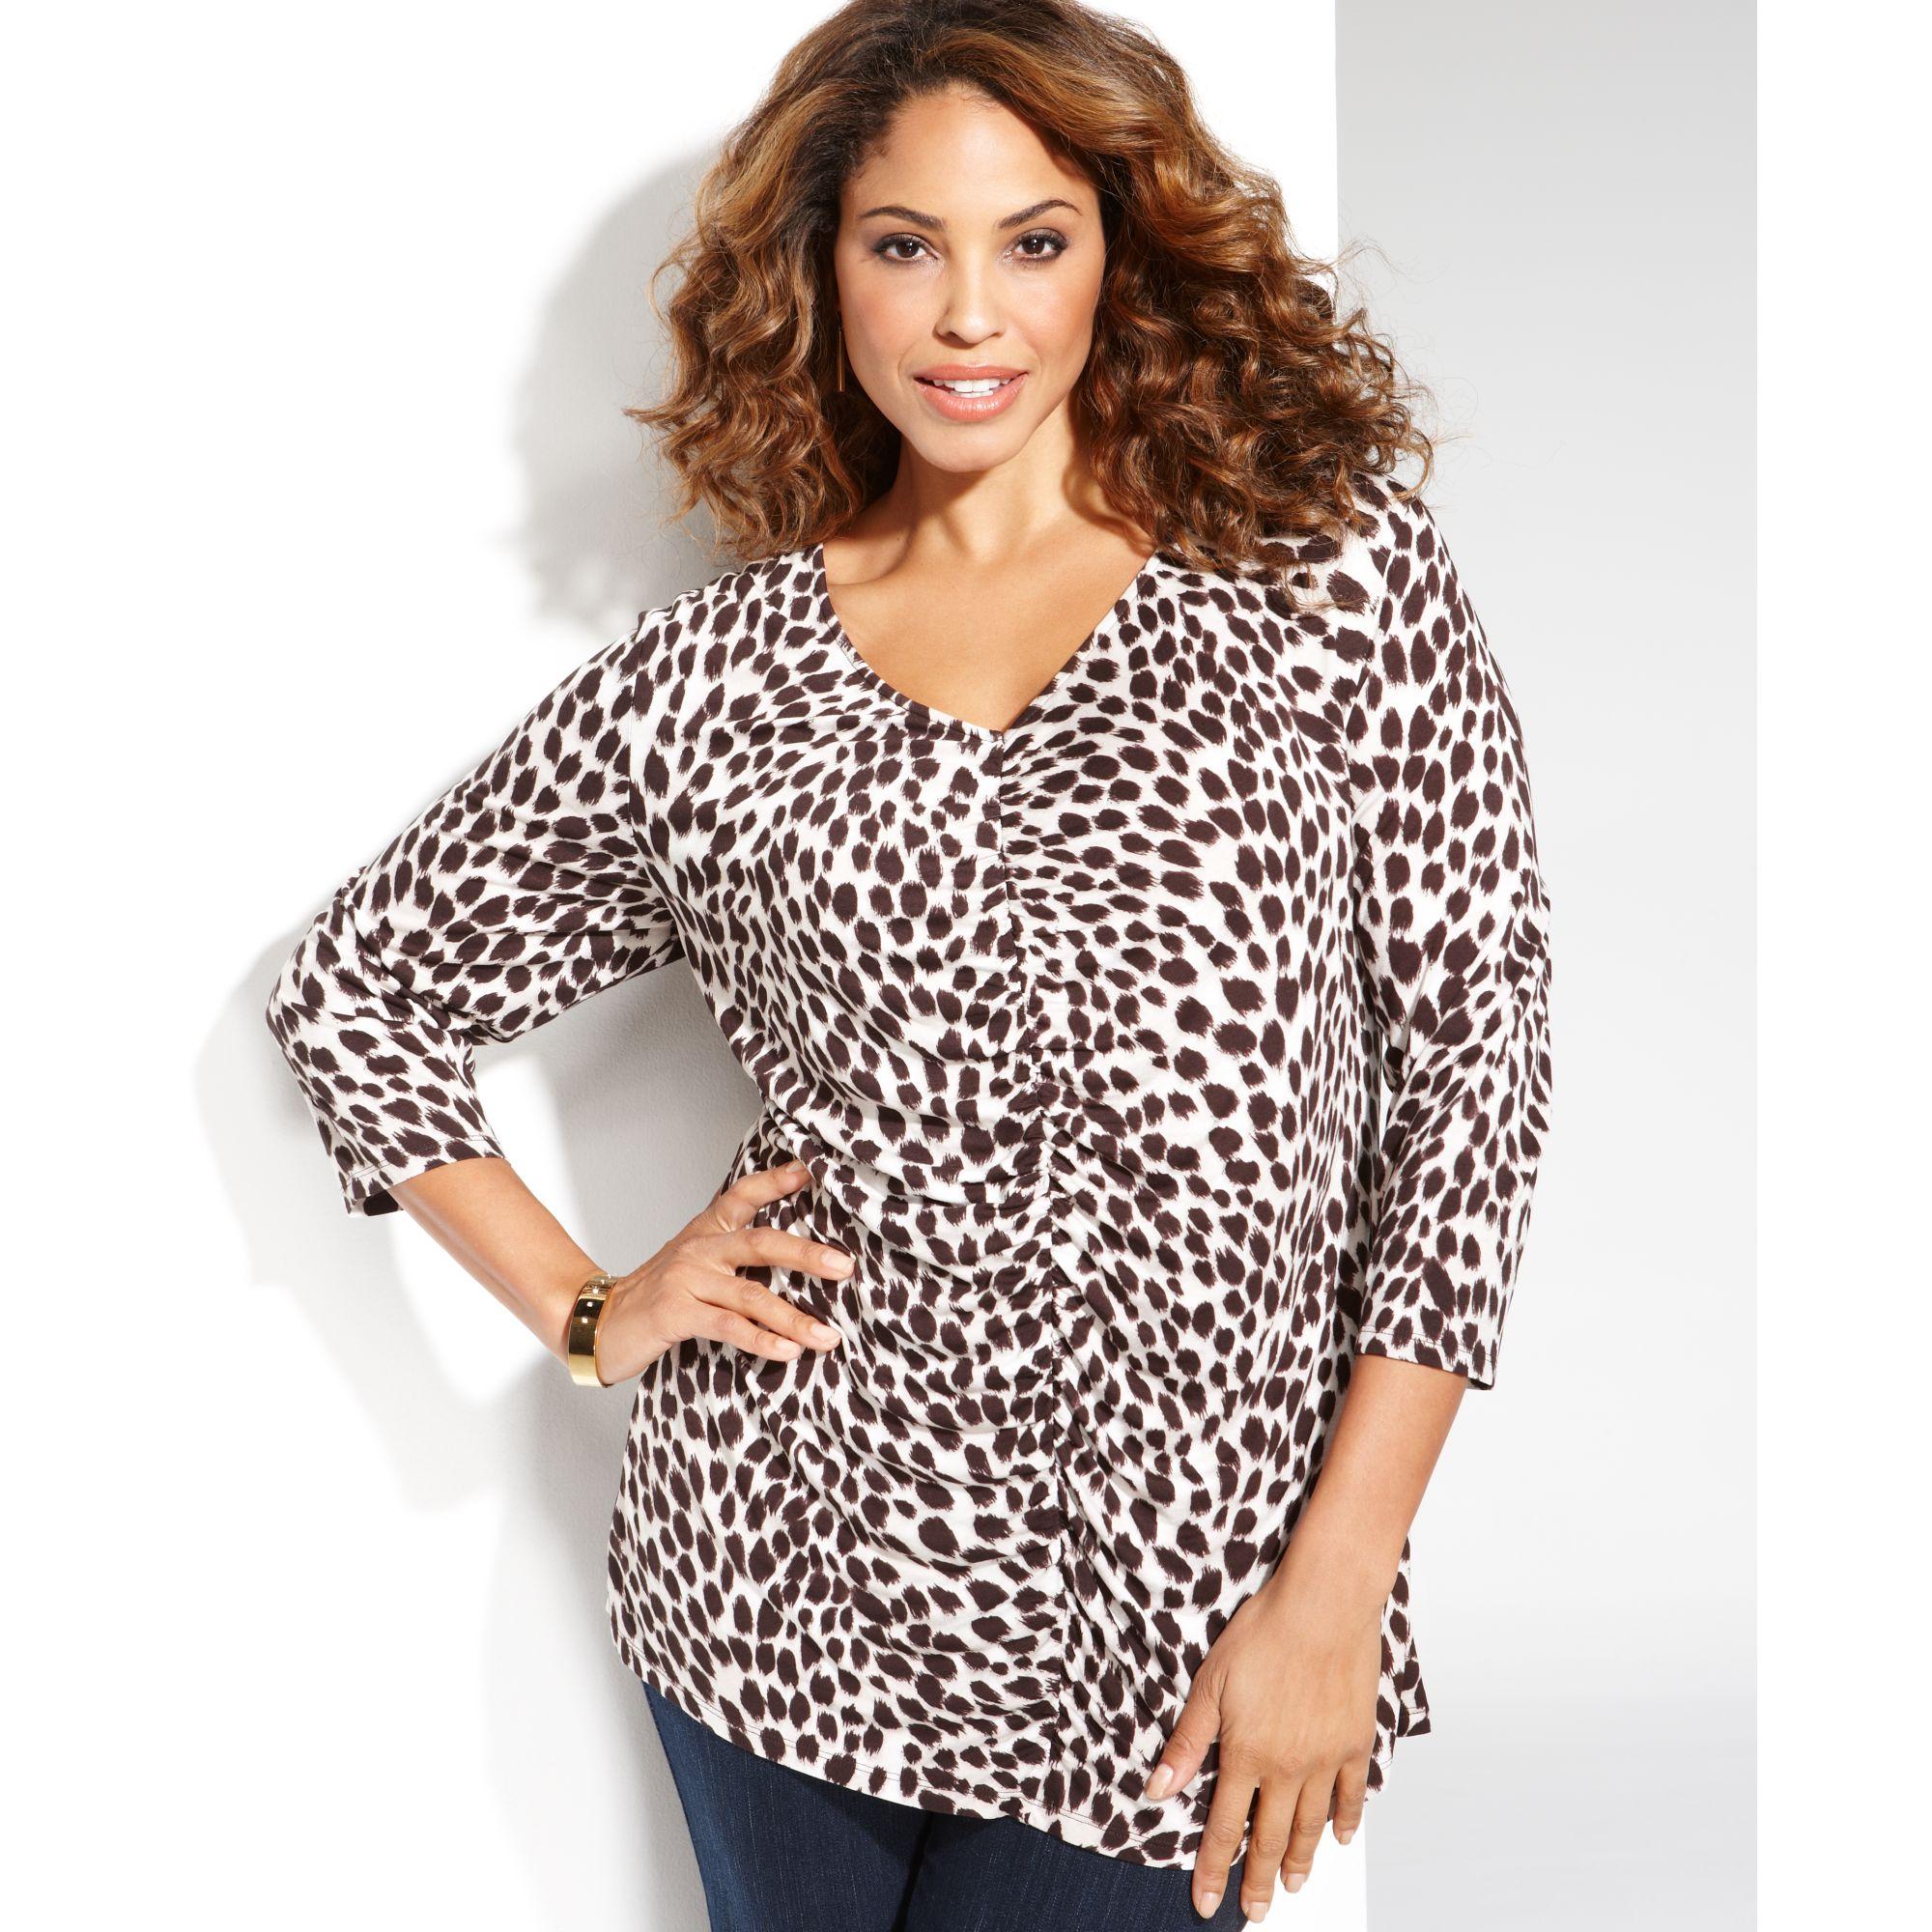 b40545ba54f Lyst - INC International Concepts Plus Size Cheetah print Ruched Top